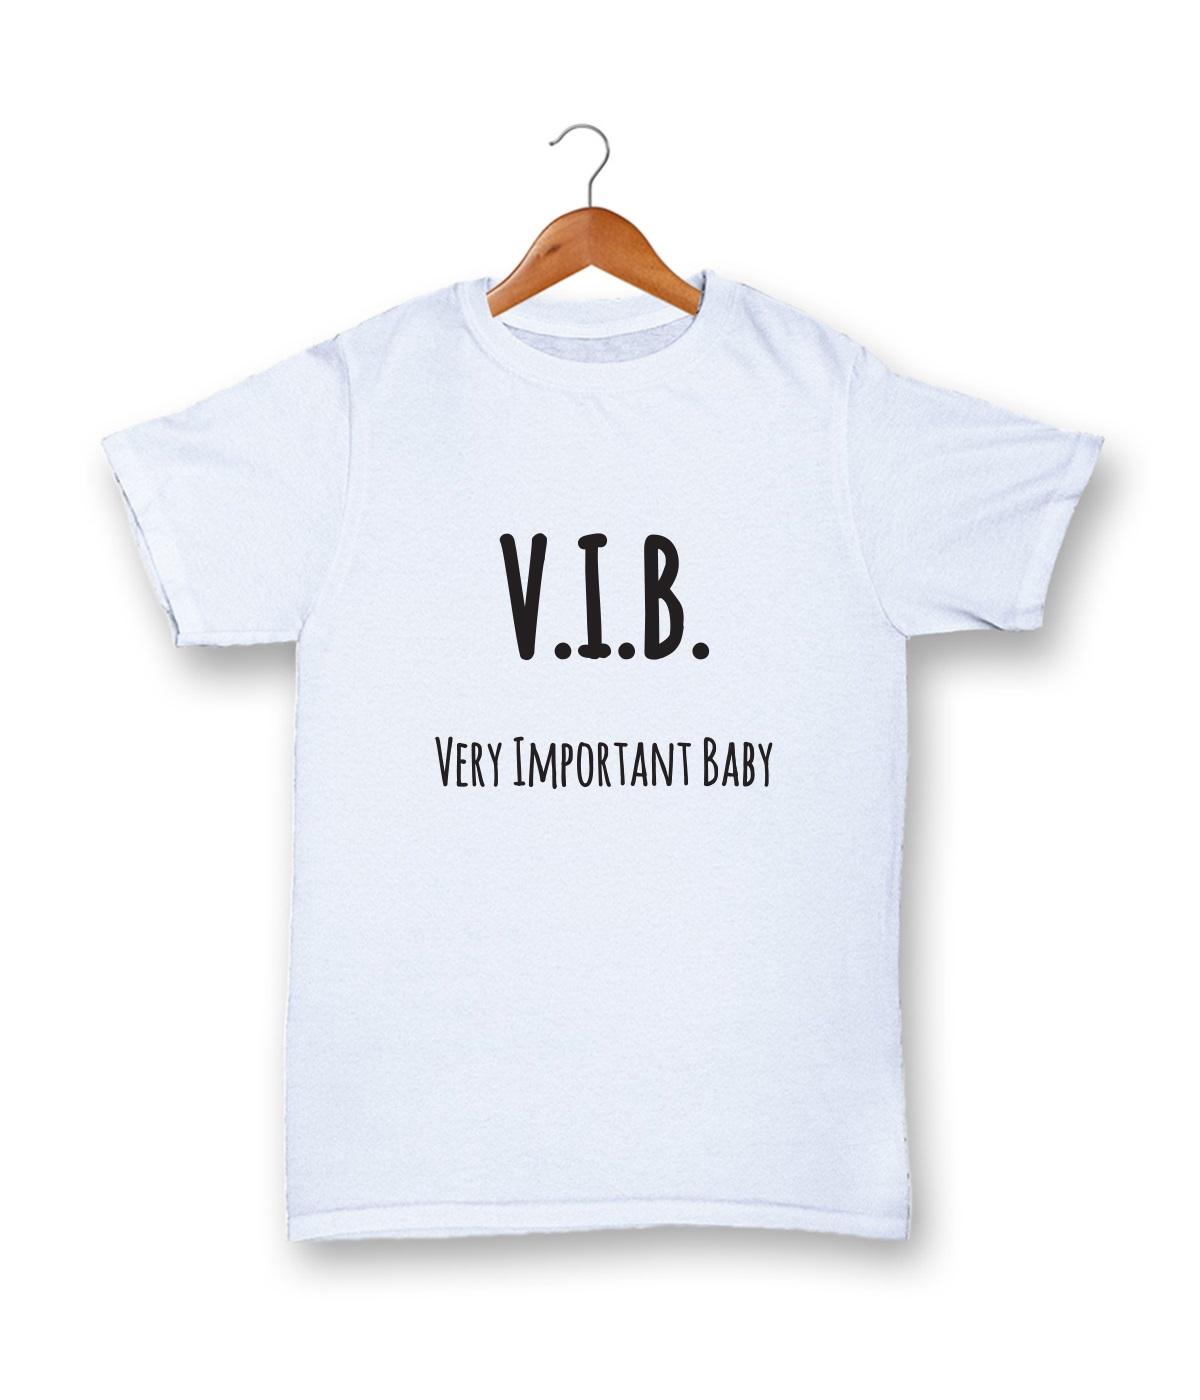 White T-shirt, 100% cotton, machine washable. Age 1-2 years. Print: V.I.B. Very Important Baby.